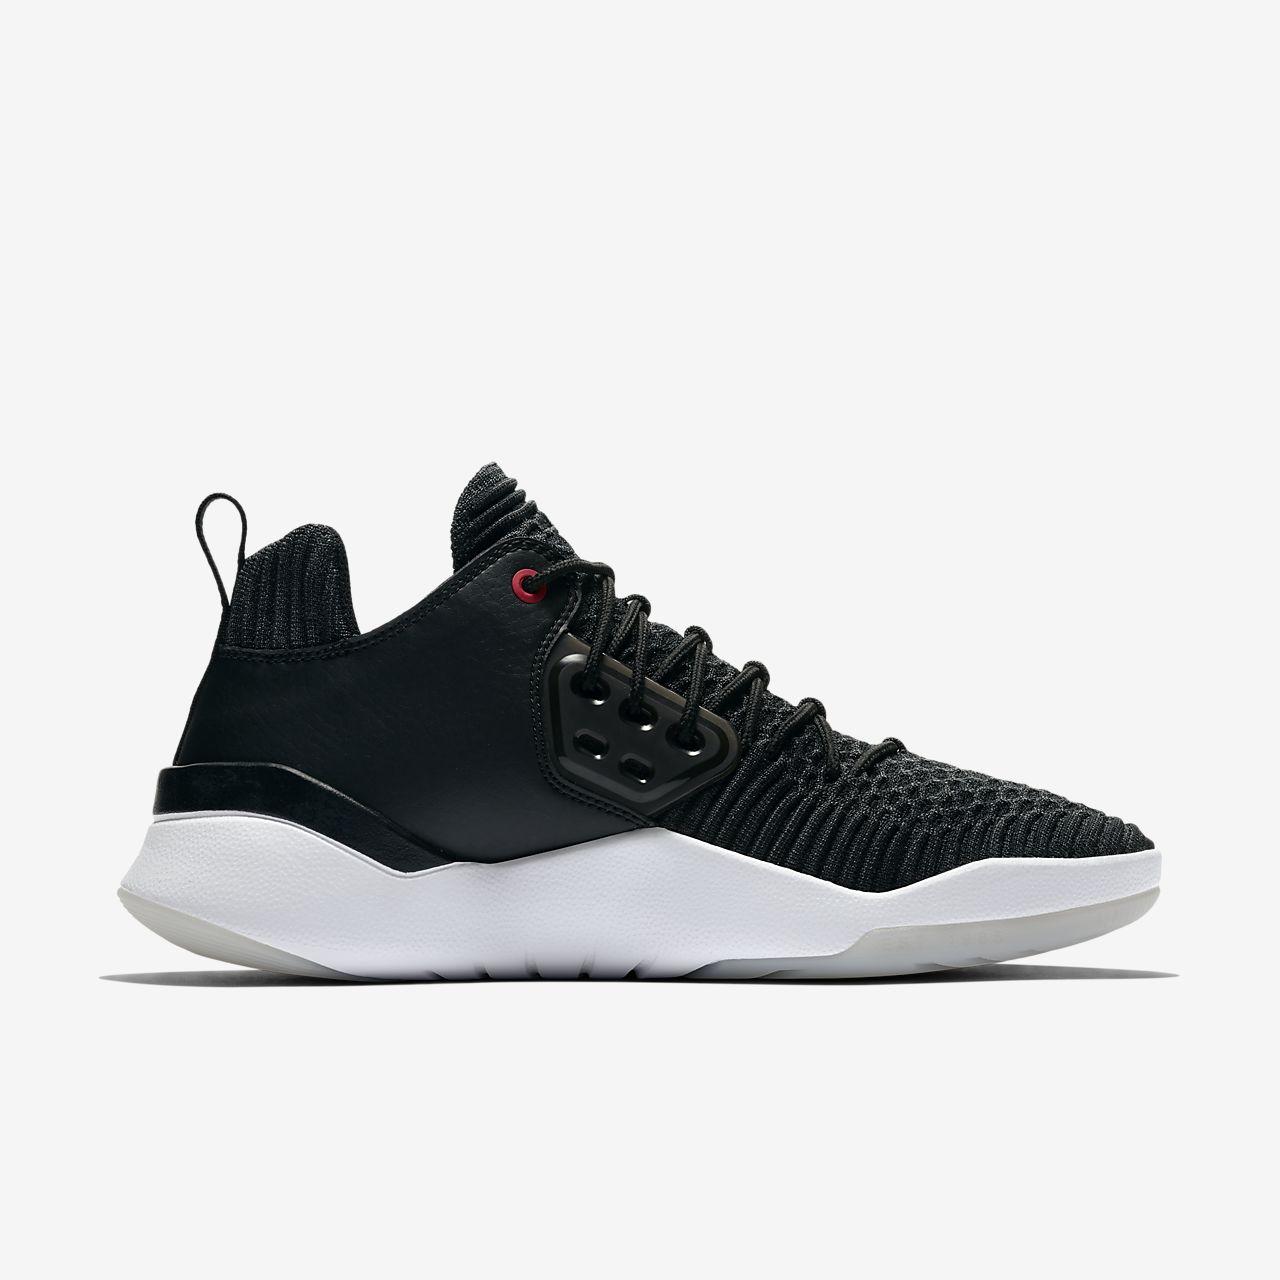 premium selection e1d09 0fb52 ... Jordan DNA LX Men s Shoe